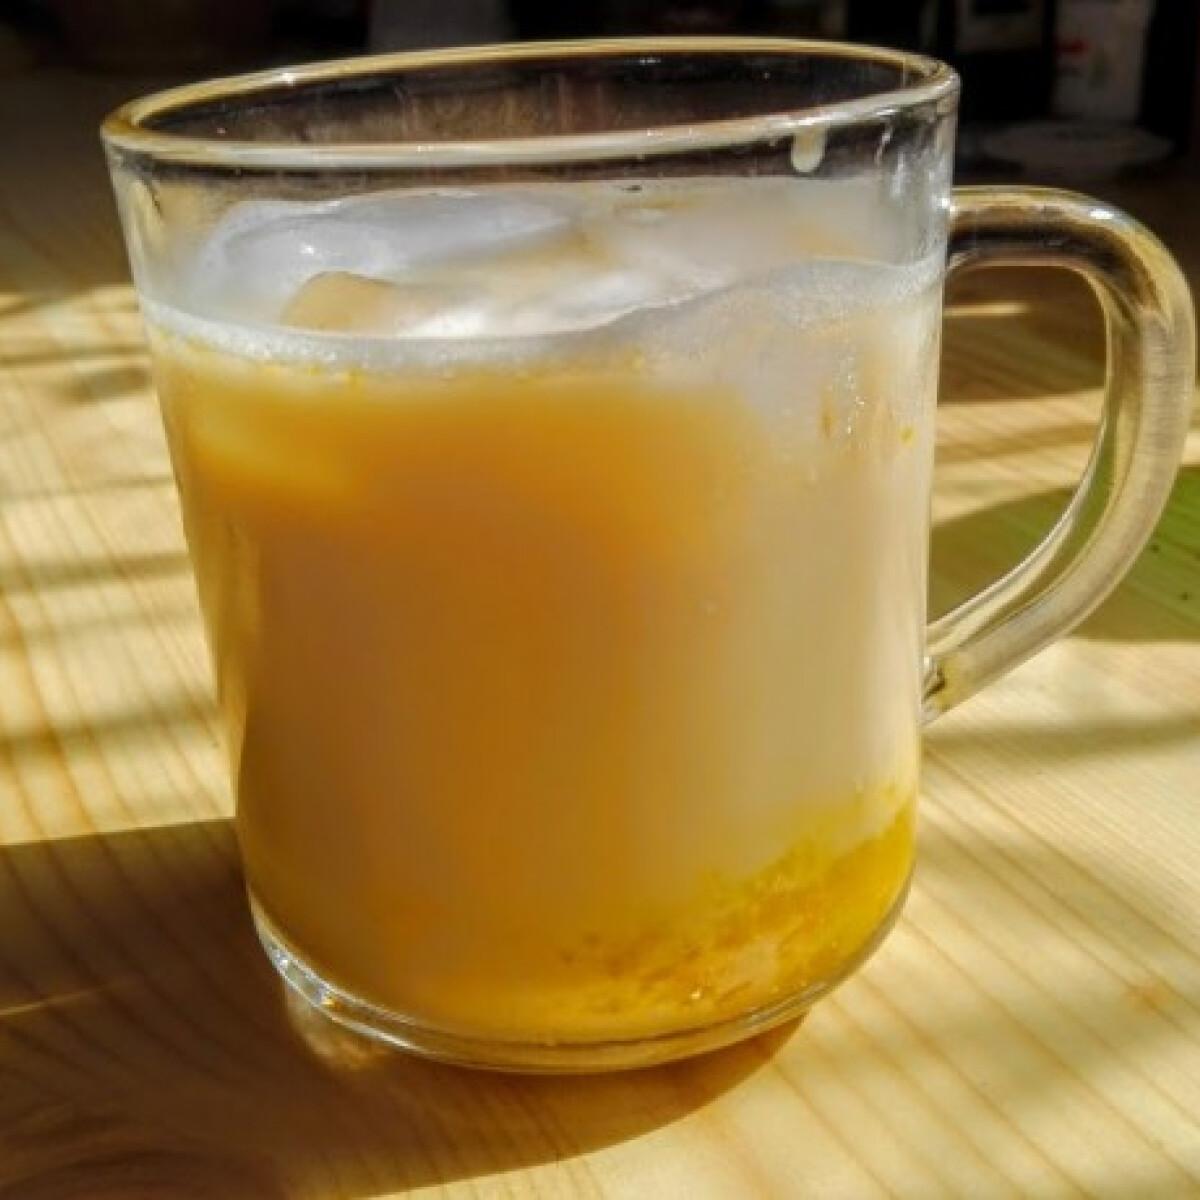 Ezen a képen: Vaníliás jeges latte